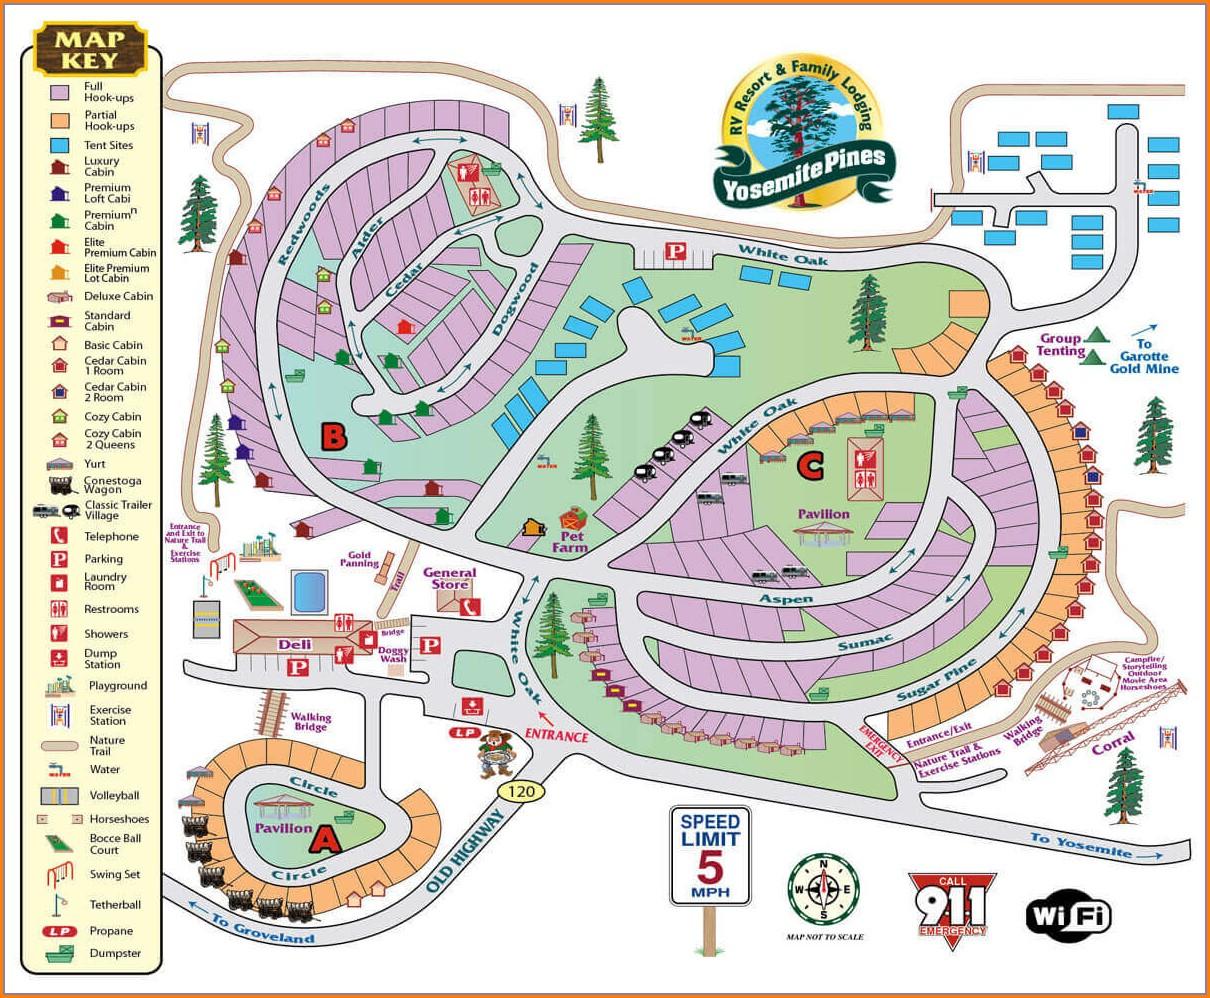 Yosemite Lakes Rv Resort Site Map